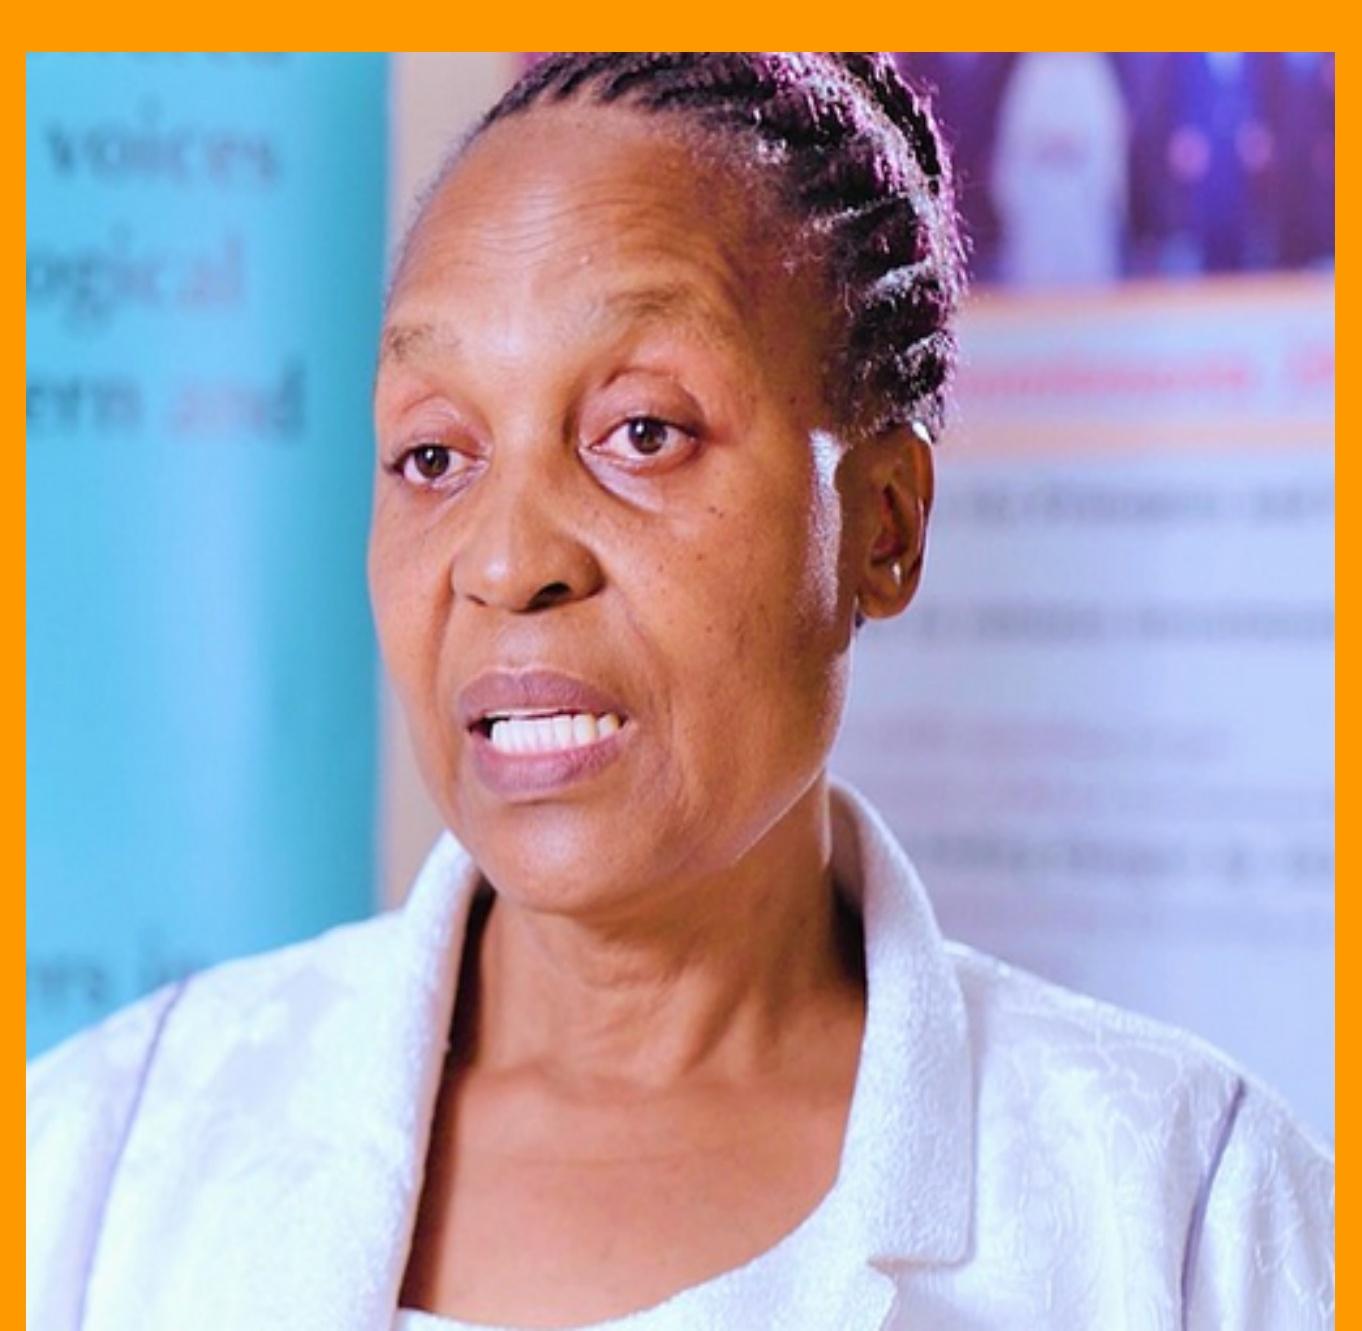 Ms. Mamalefestane Phakoe